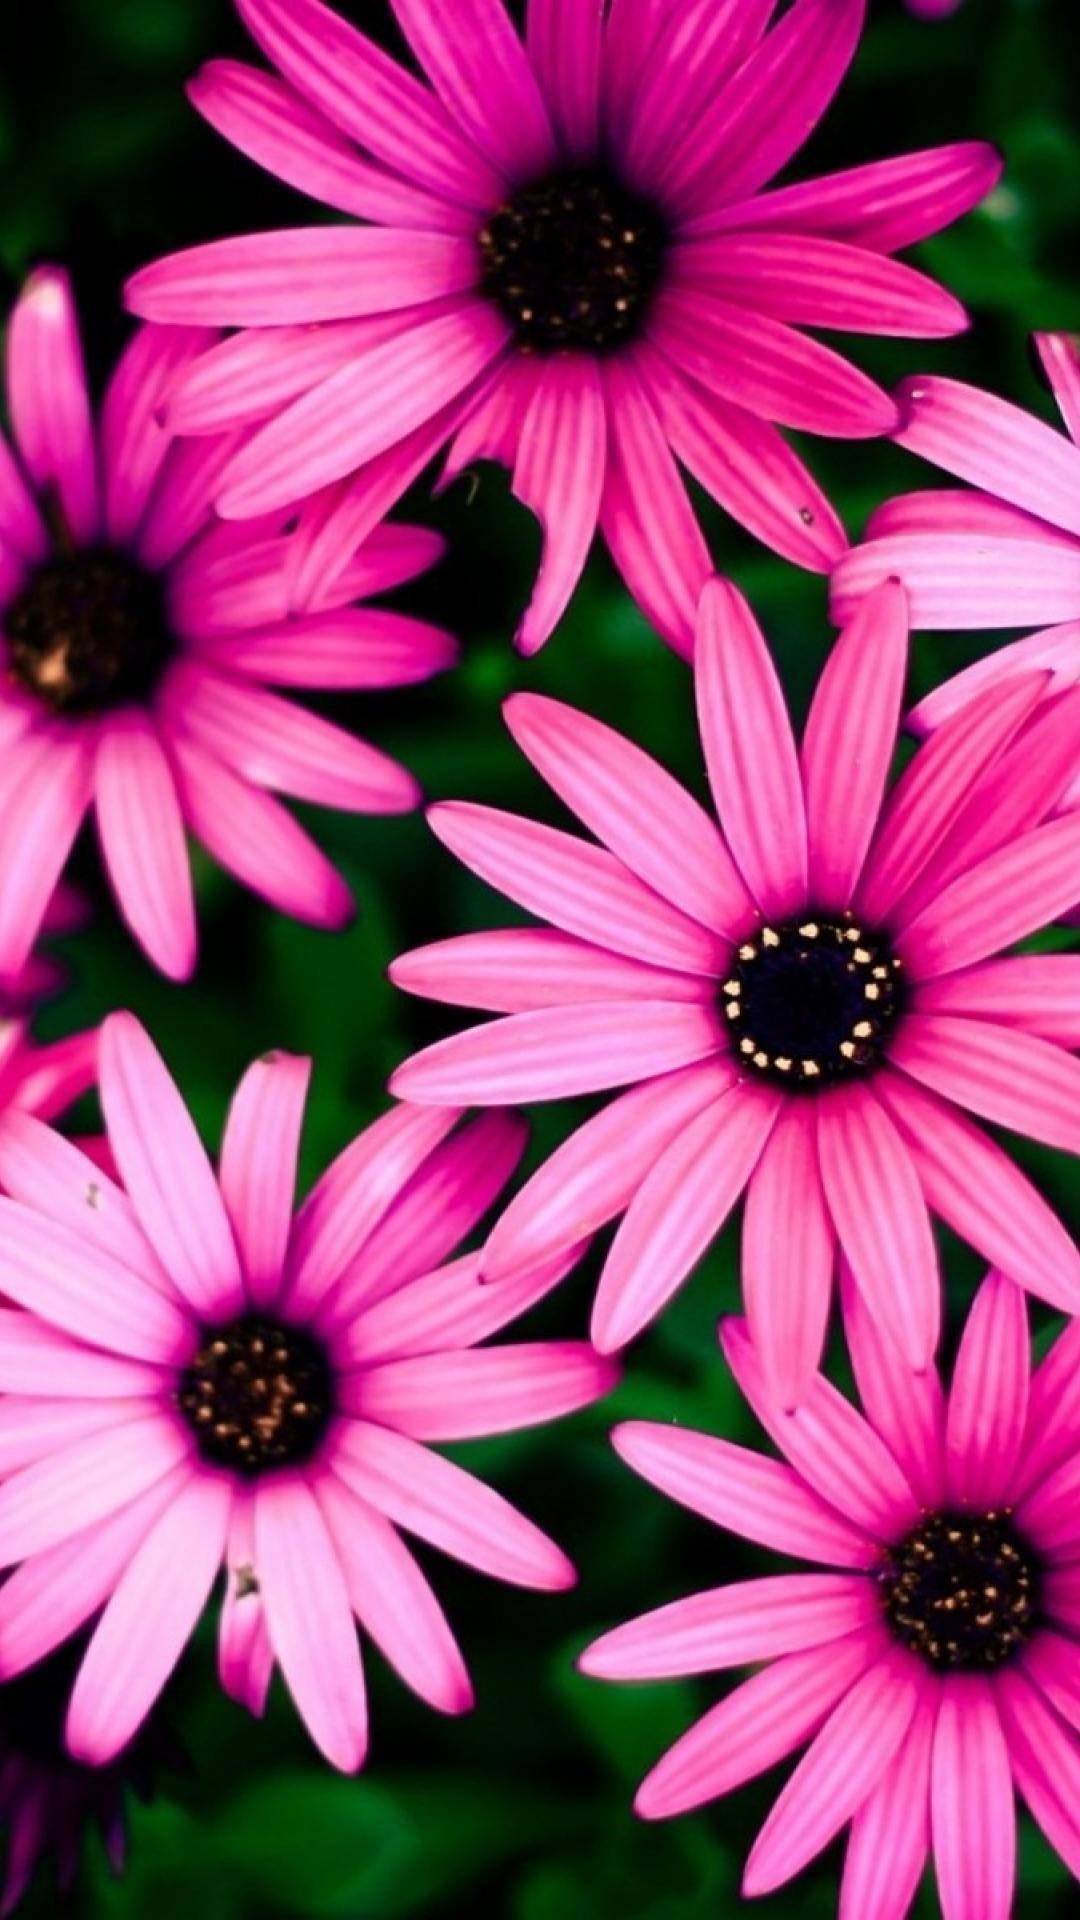 Wallpaper Phone Iphone 6 Plus Flower